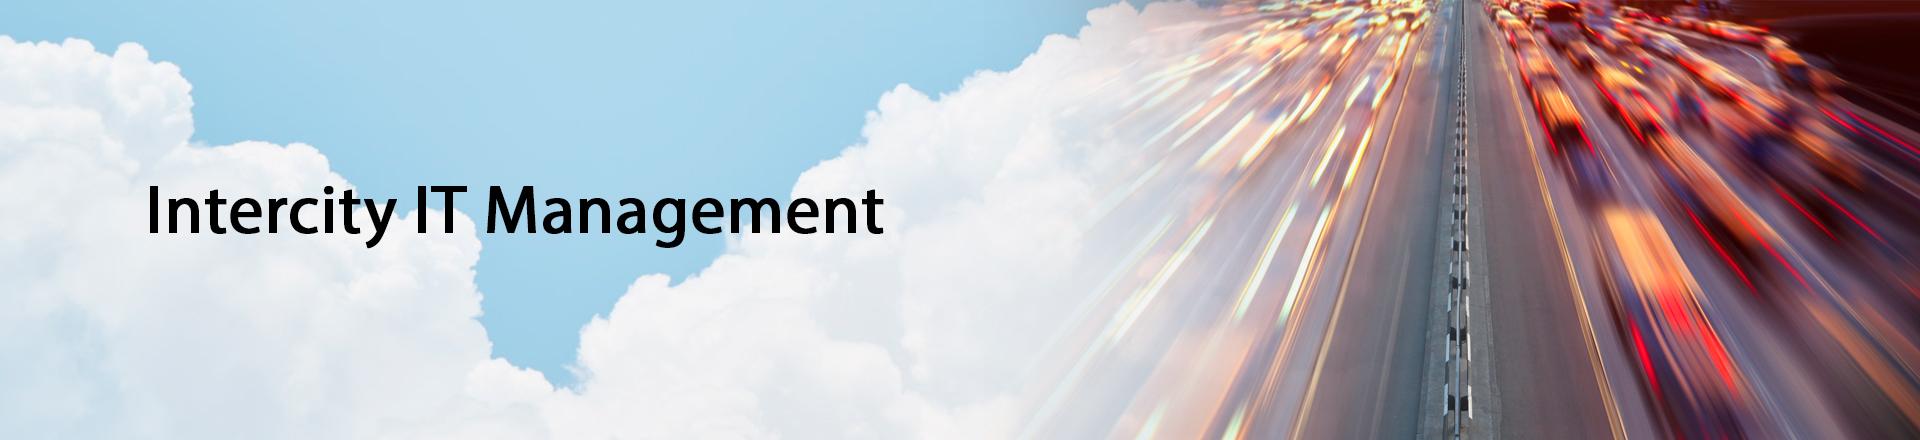 Intercity IT Management